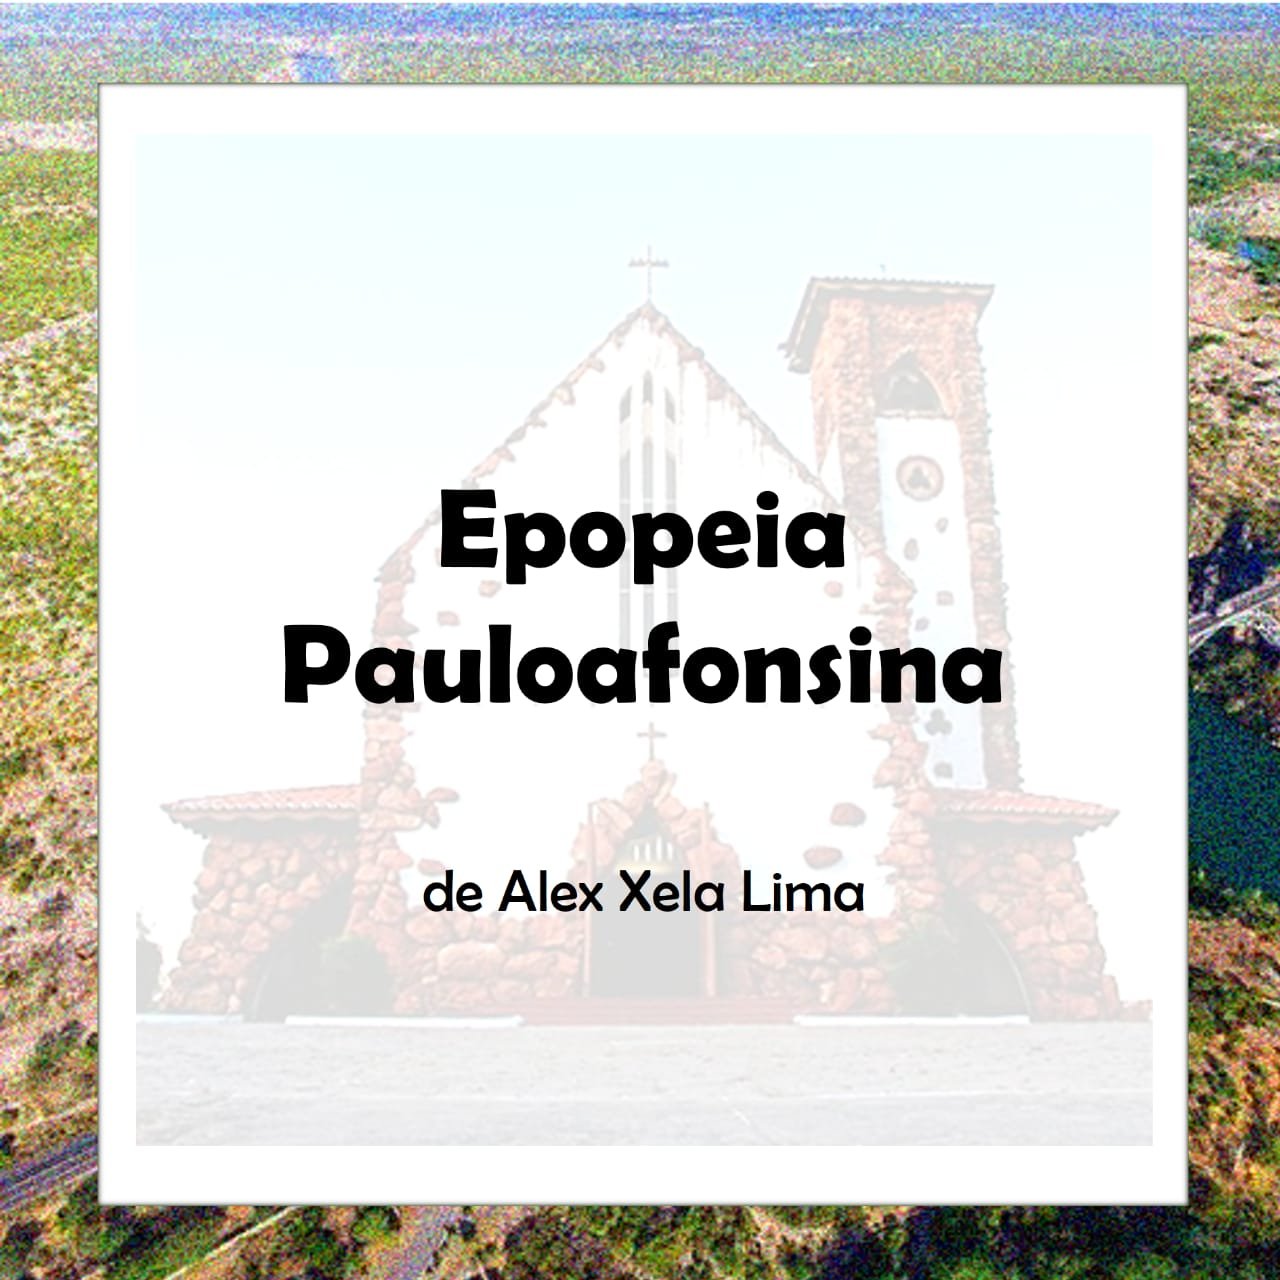 Epopeia Pauloafonsina